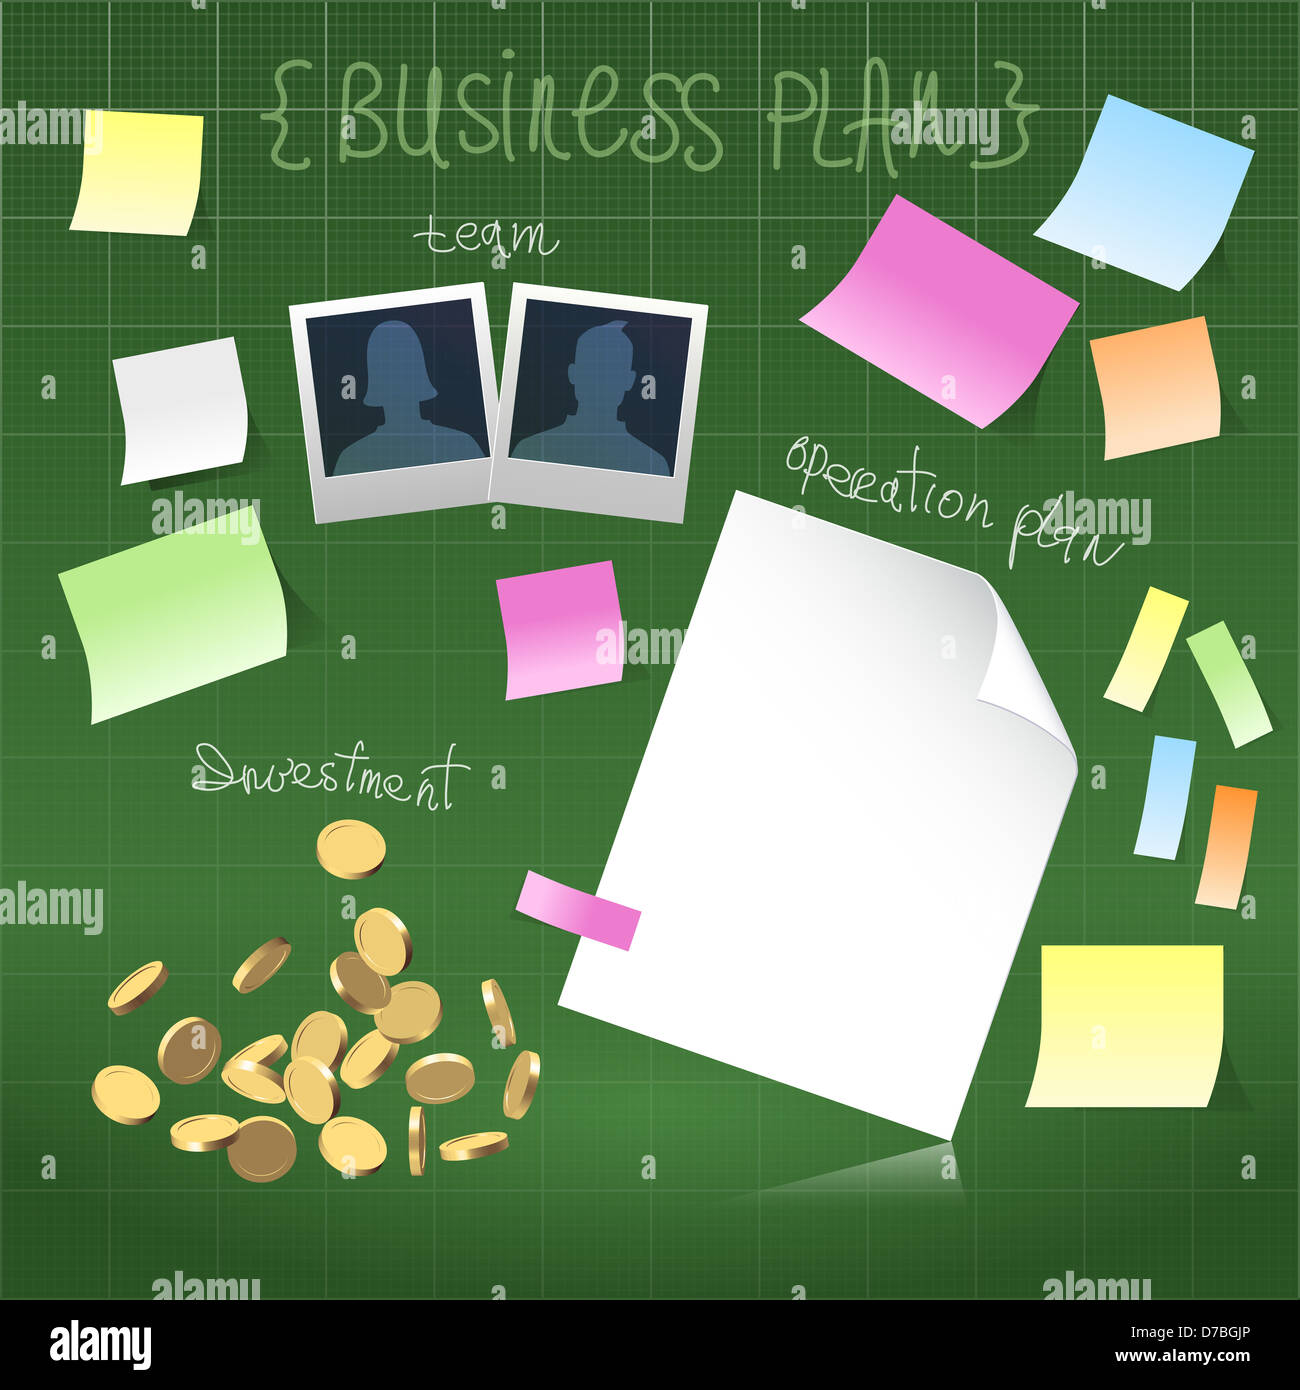 Business plan in development on a green blueprint background stock business plan in development on a green blueprint background malvernweather Images